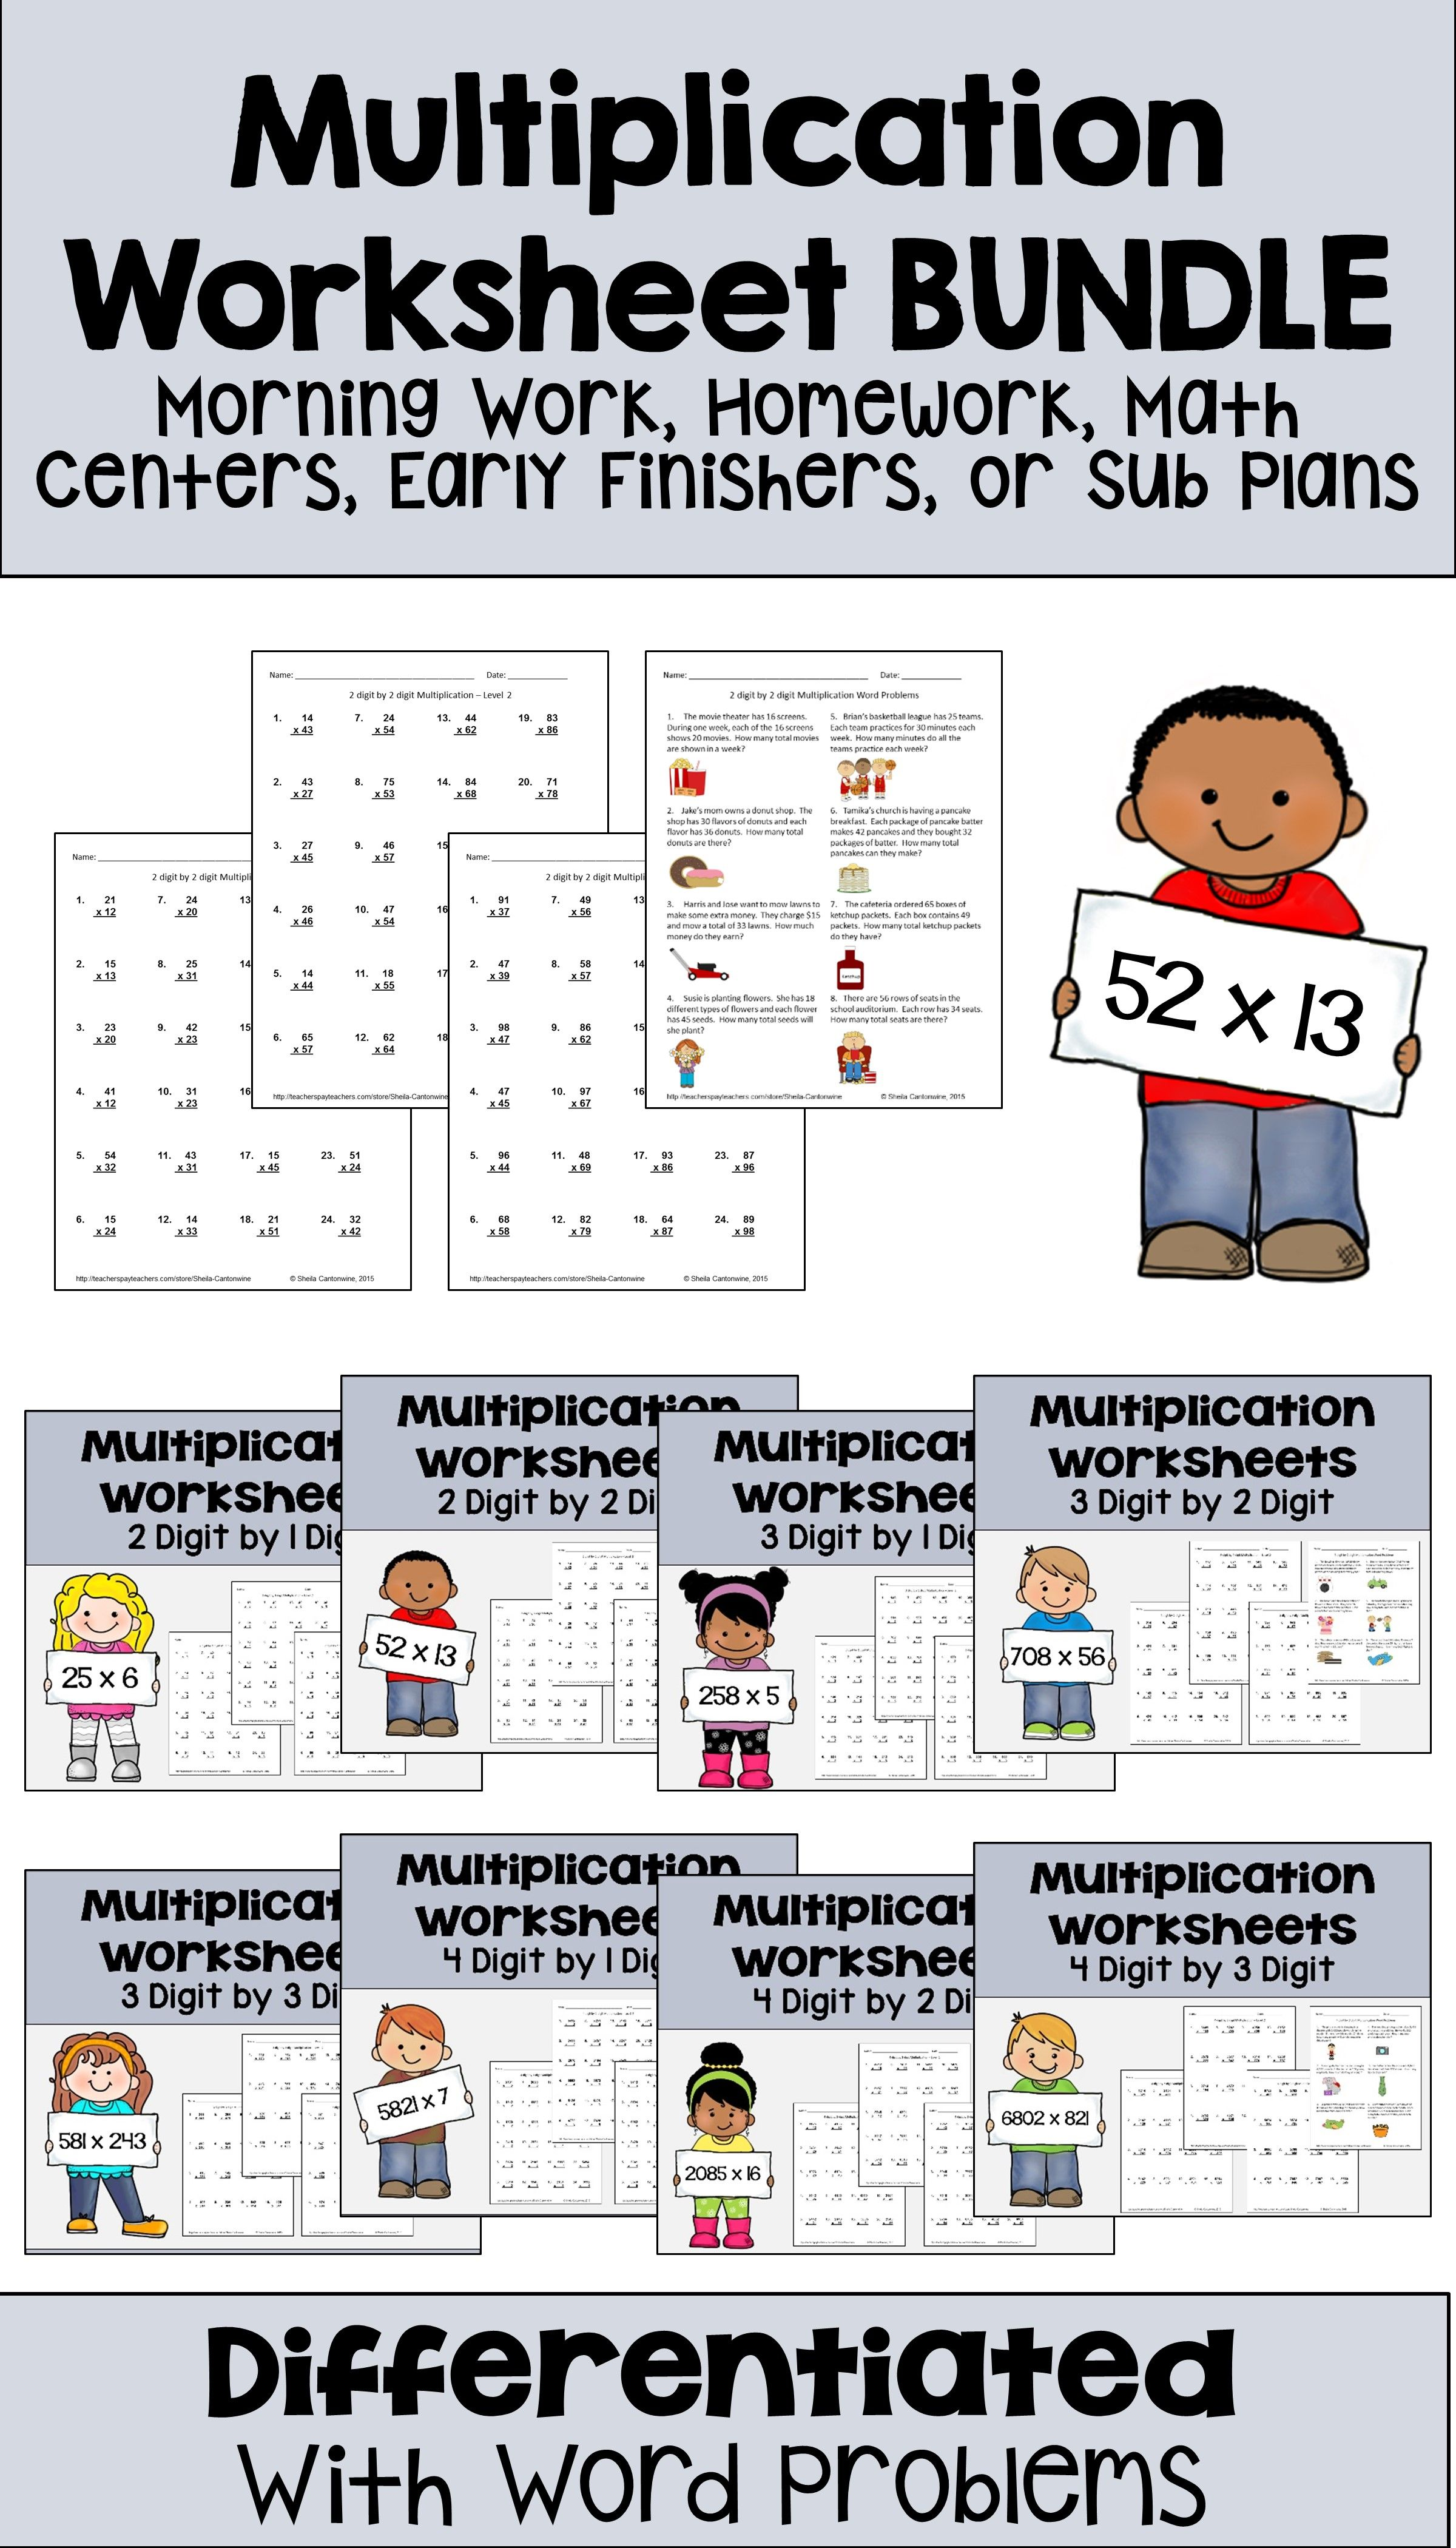 Multiplication Worksheet Bundle Differentiated